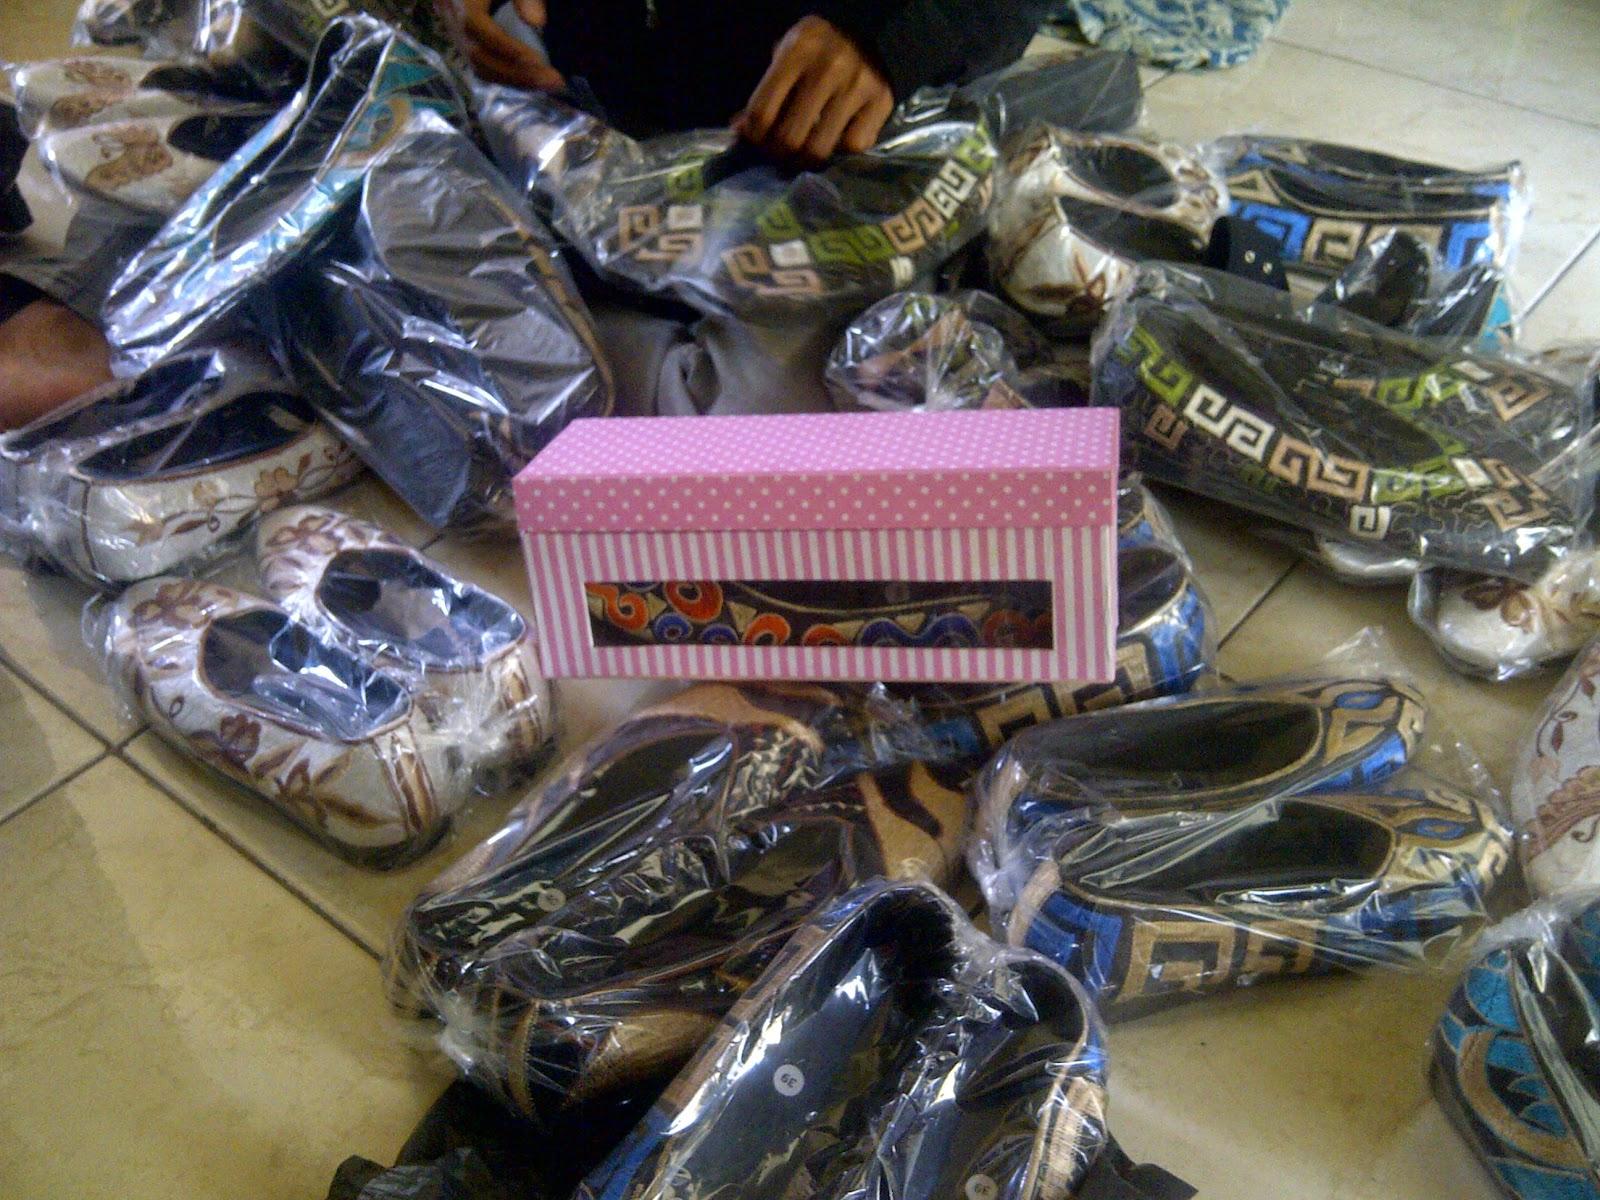 Grosir Sepatu Bordir Malang, Grosir Sepatu Bordir Jakarta, www.distributorsepatumurah.com